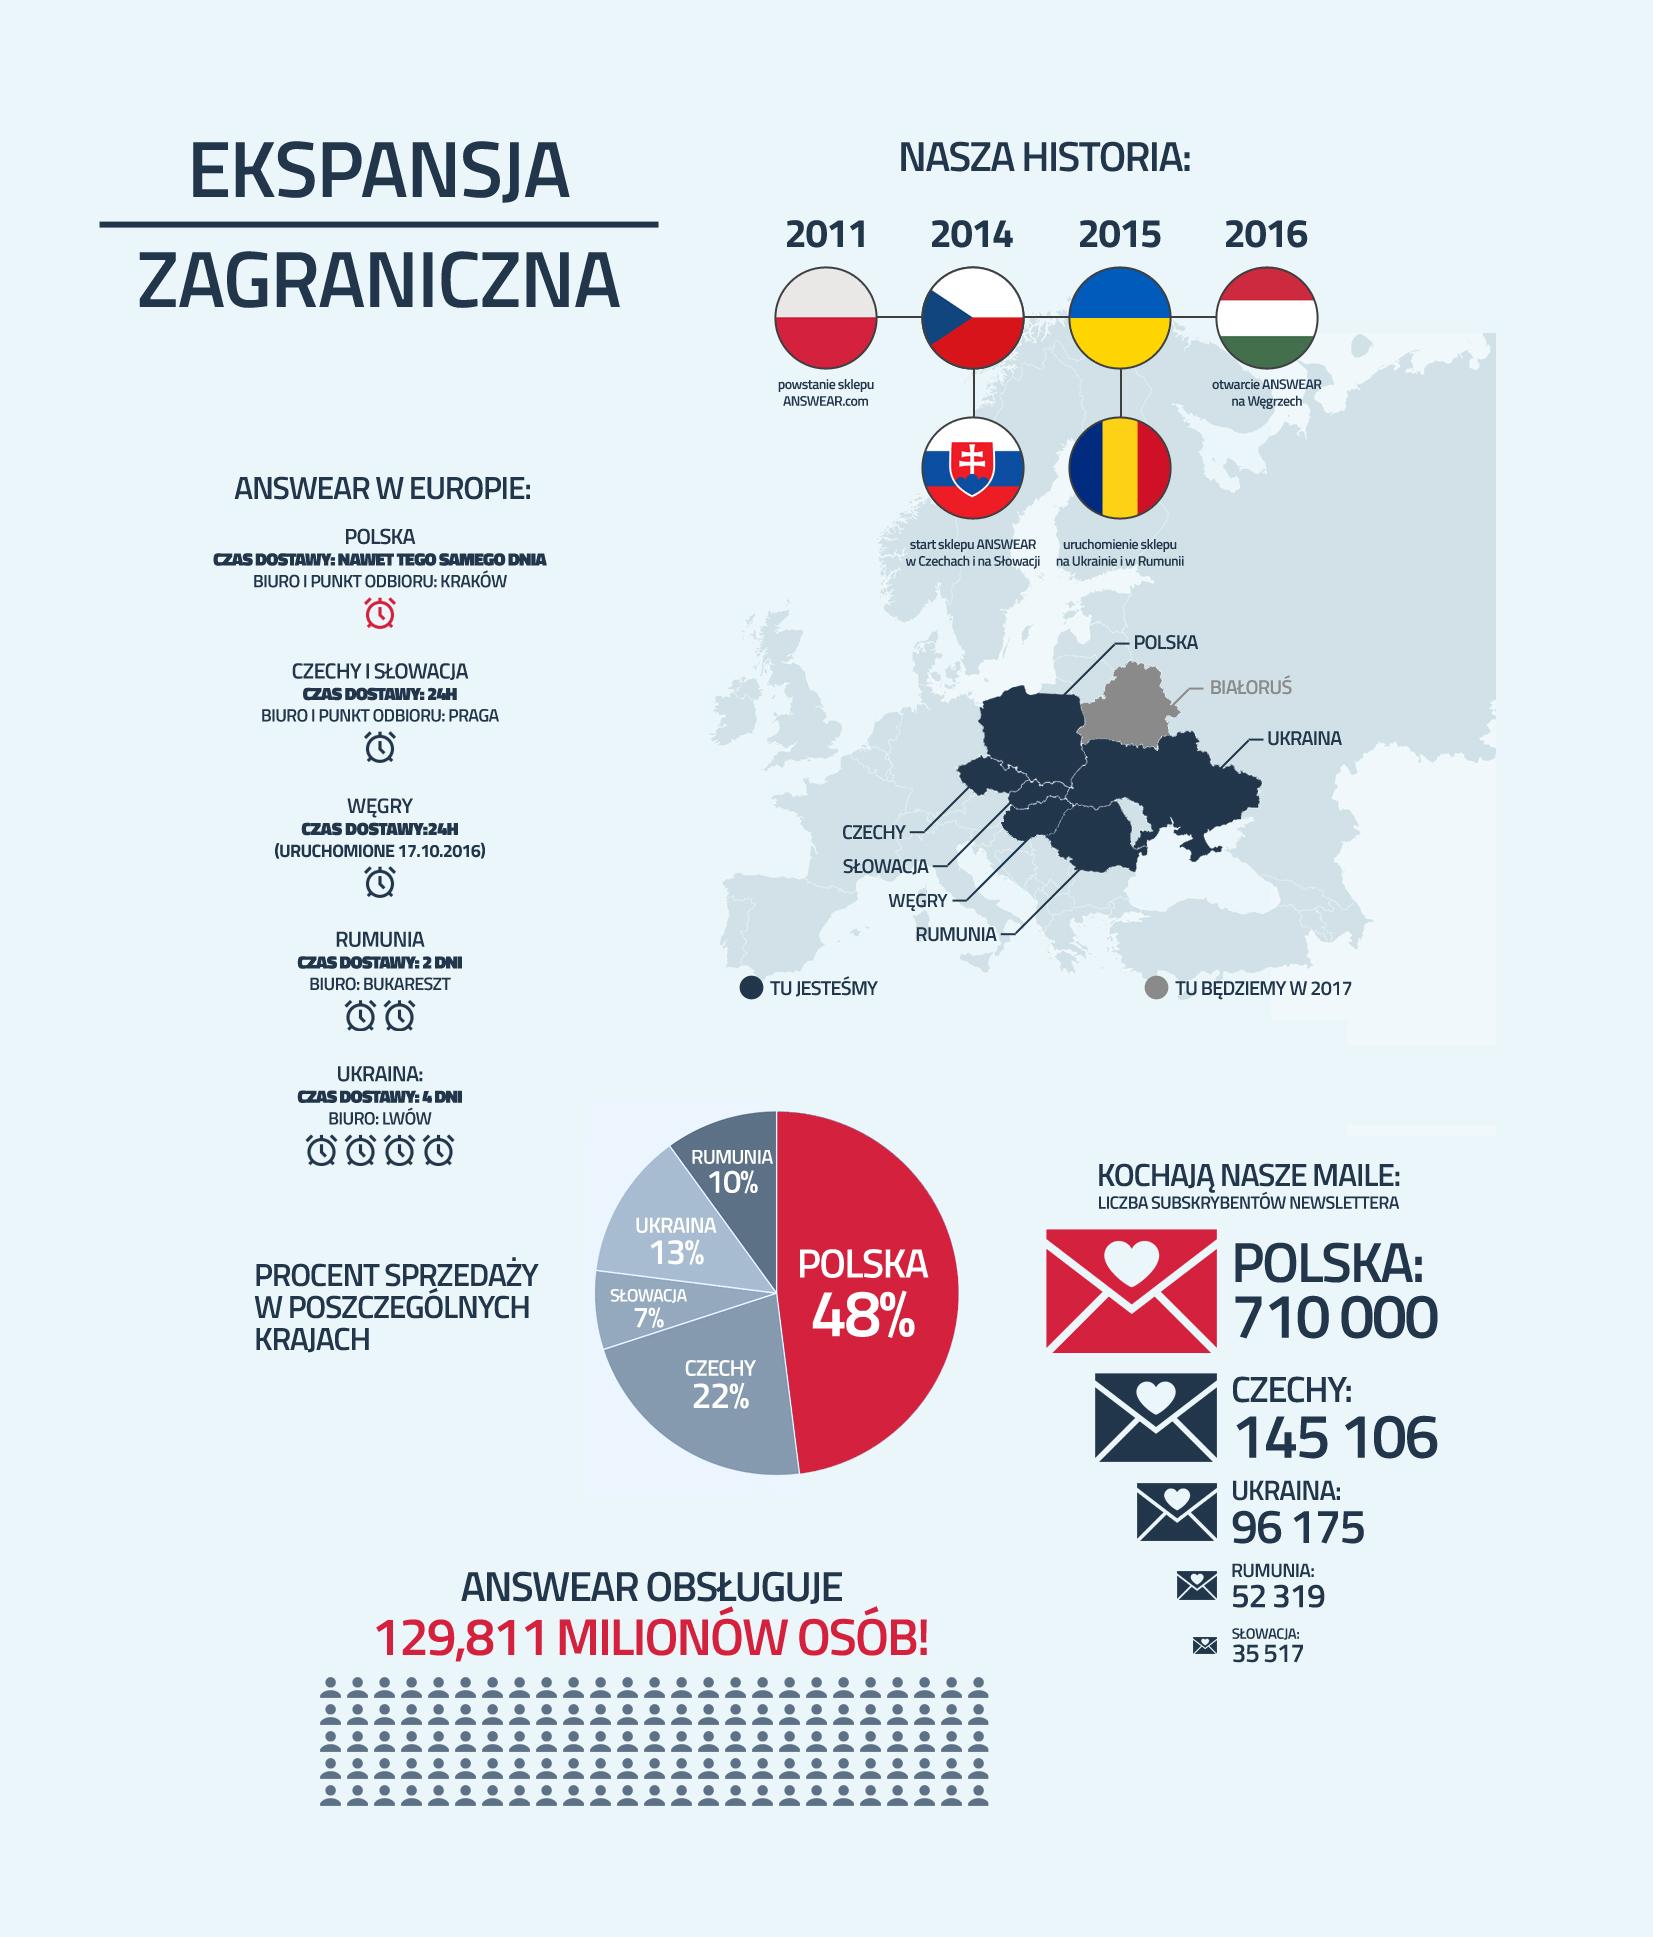 ekspansja-zagraniczna-infografika